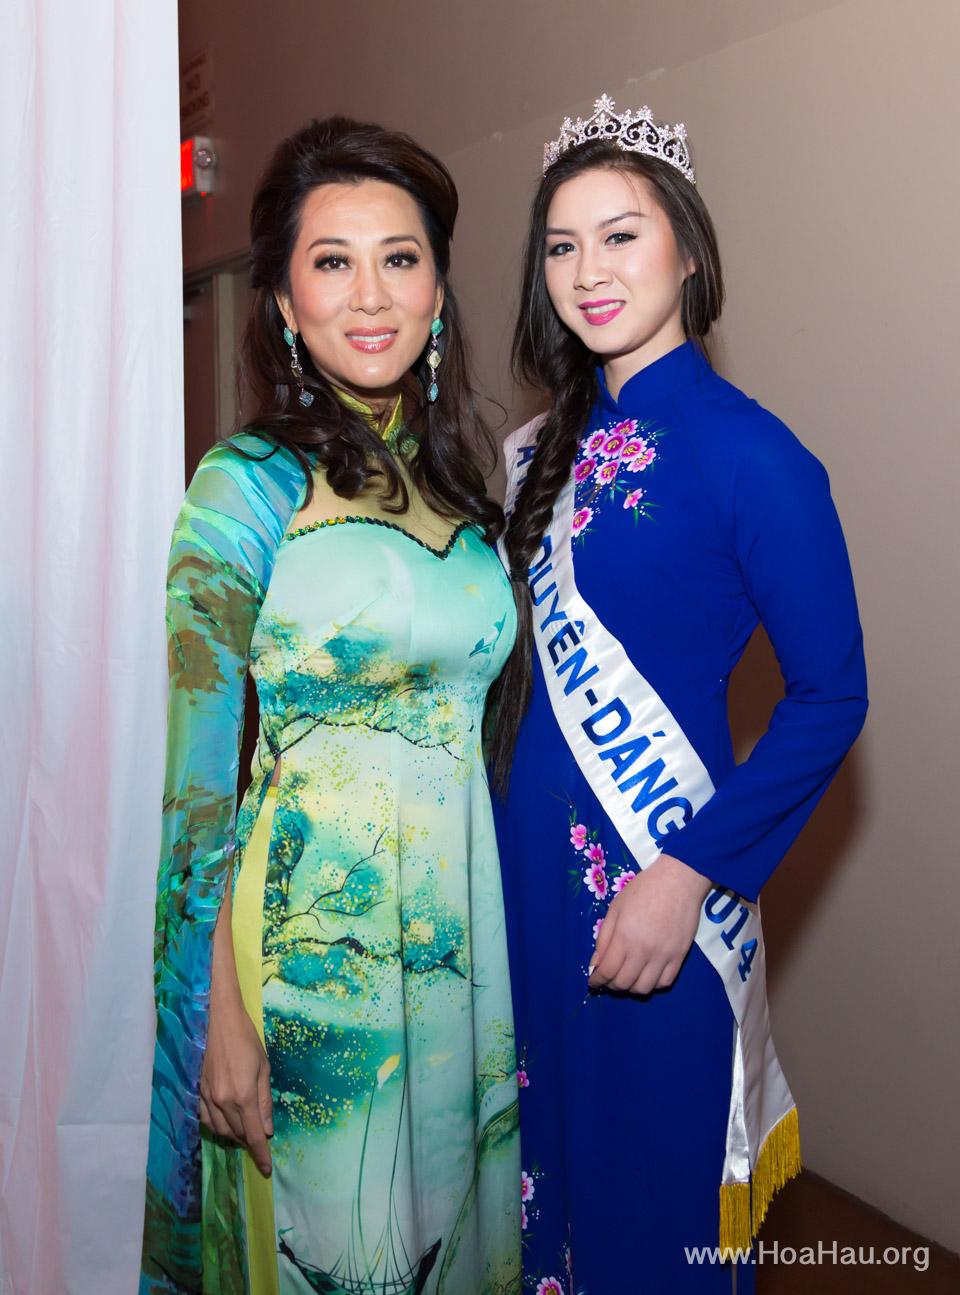 Tet Fairgrounds 2014 - Hoa Hậu Áo Dài Bắc Cali - Miss Vietnam of Northern California - Image 115